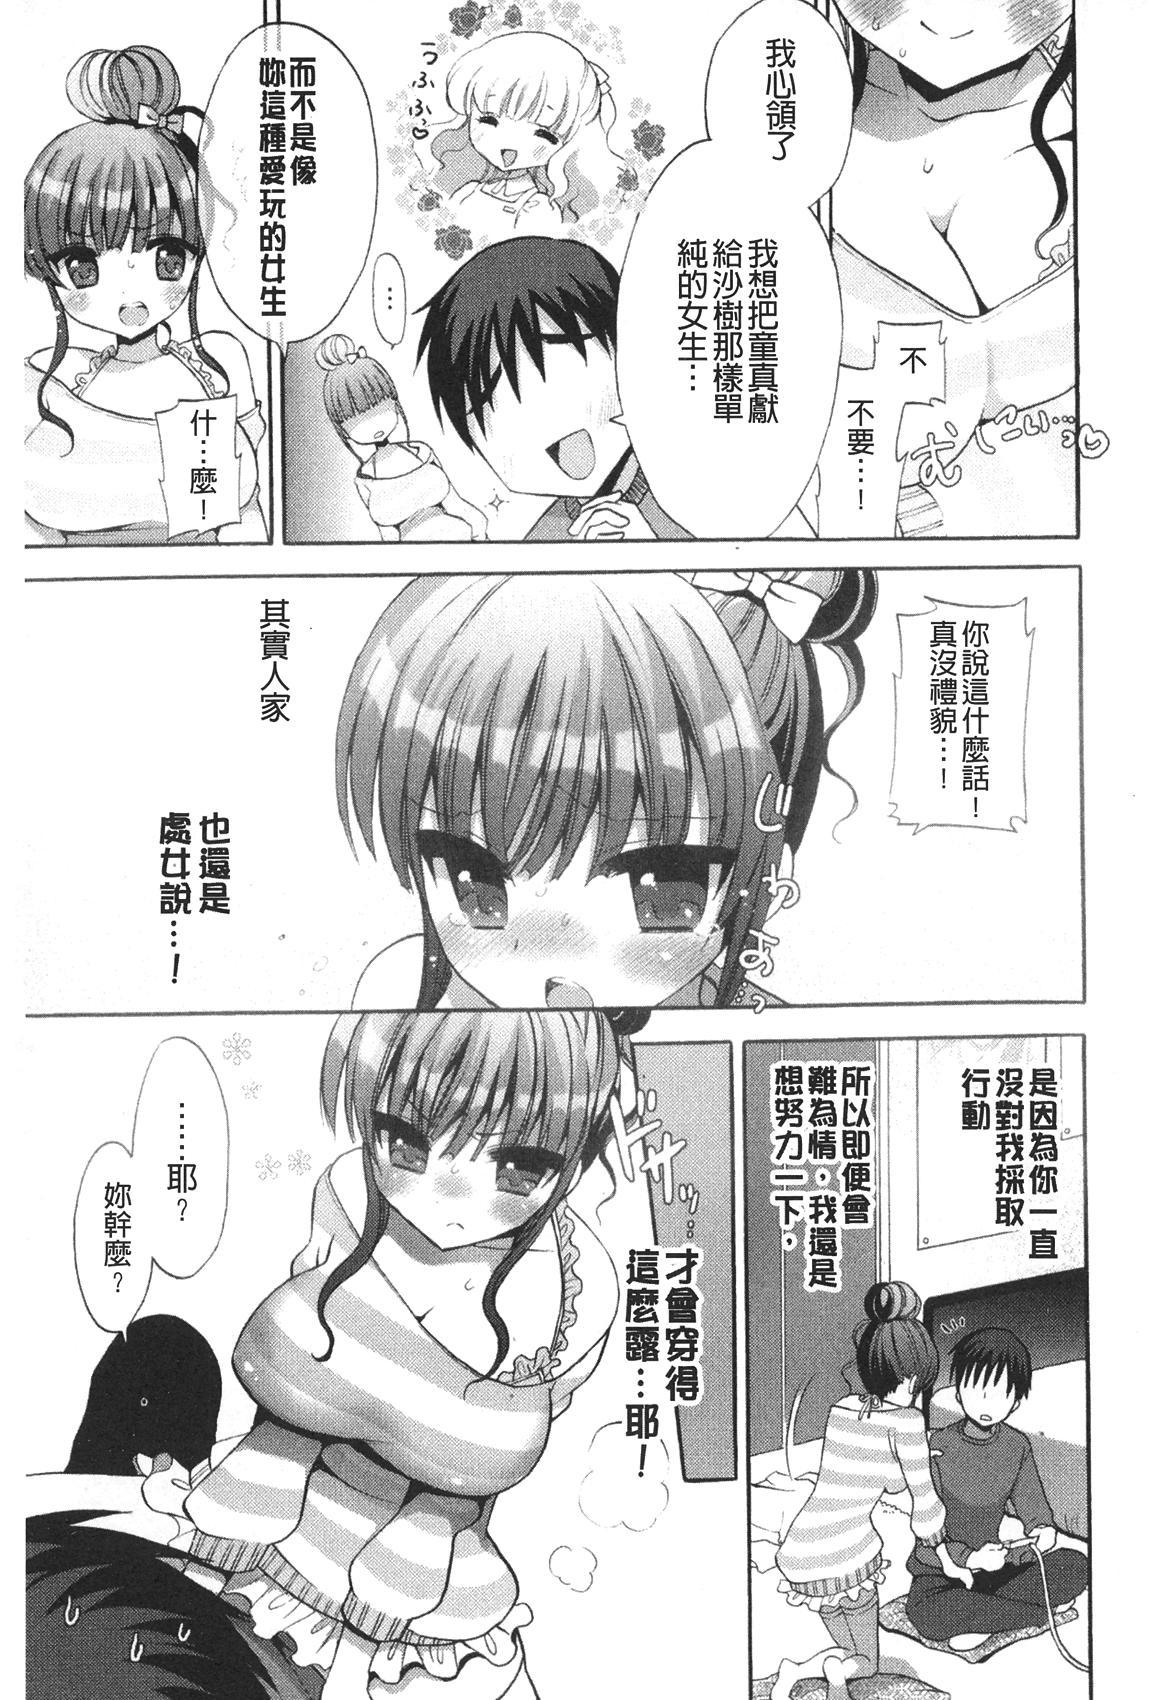 Icha Love! | 稚嫩女之愛! 59